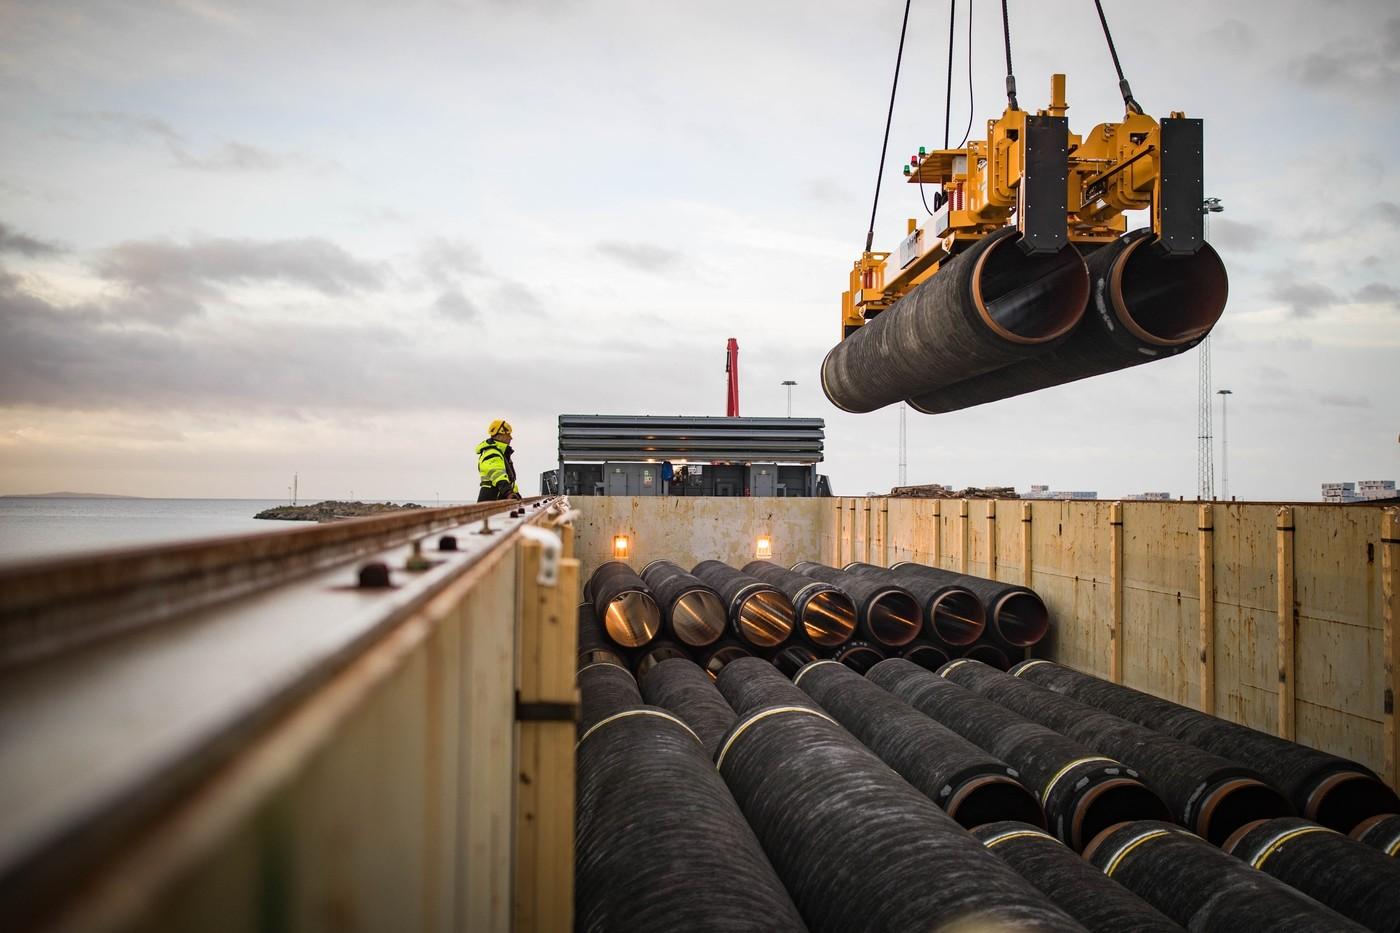 Фото © Nord Stream 2 / Aксель Шмидт